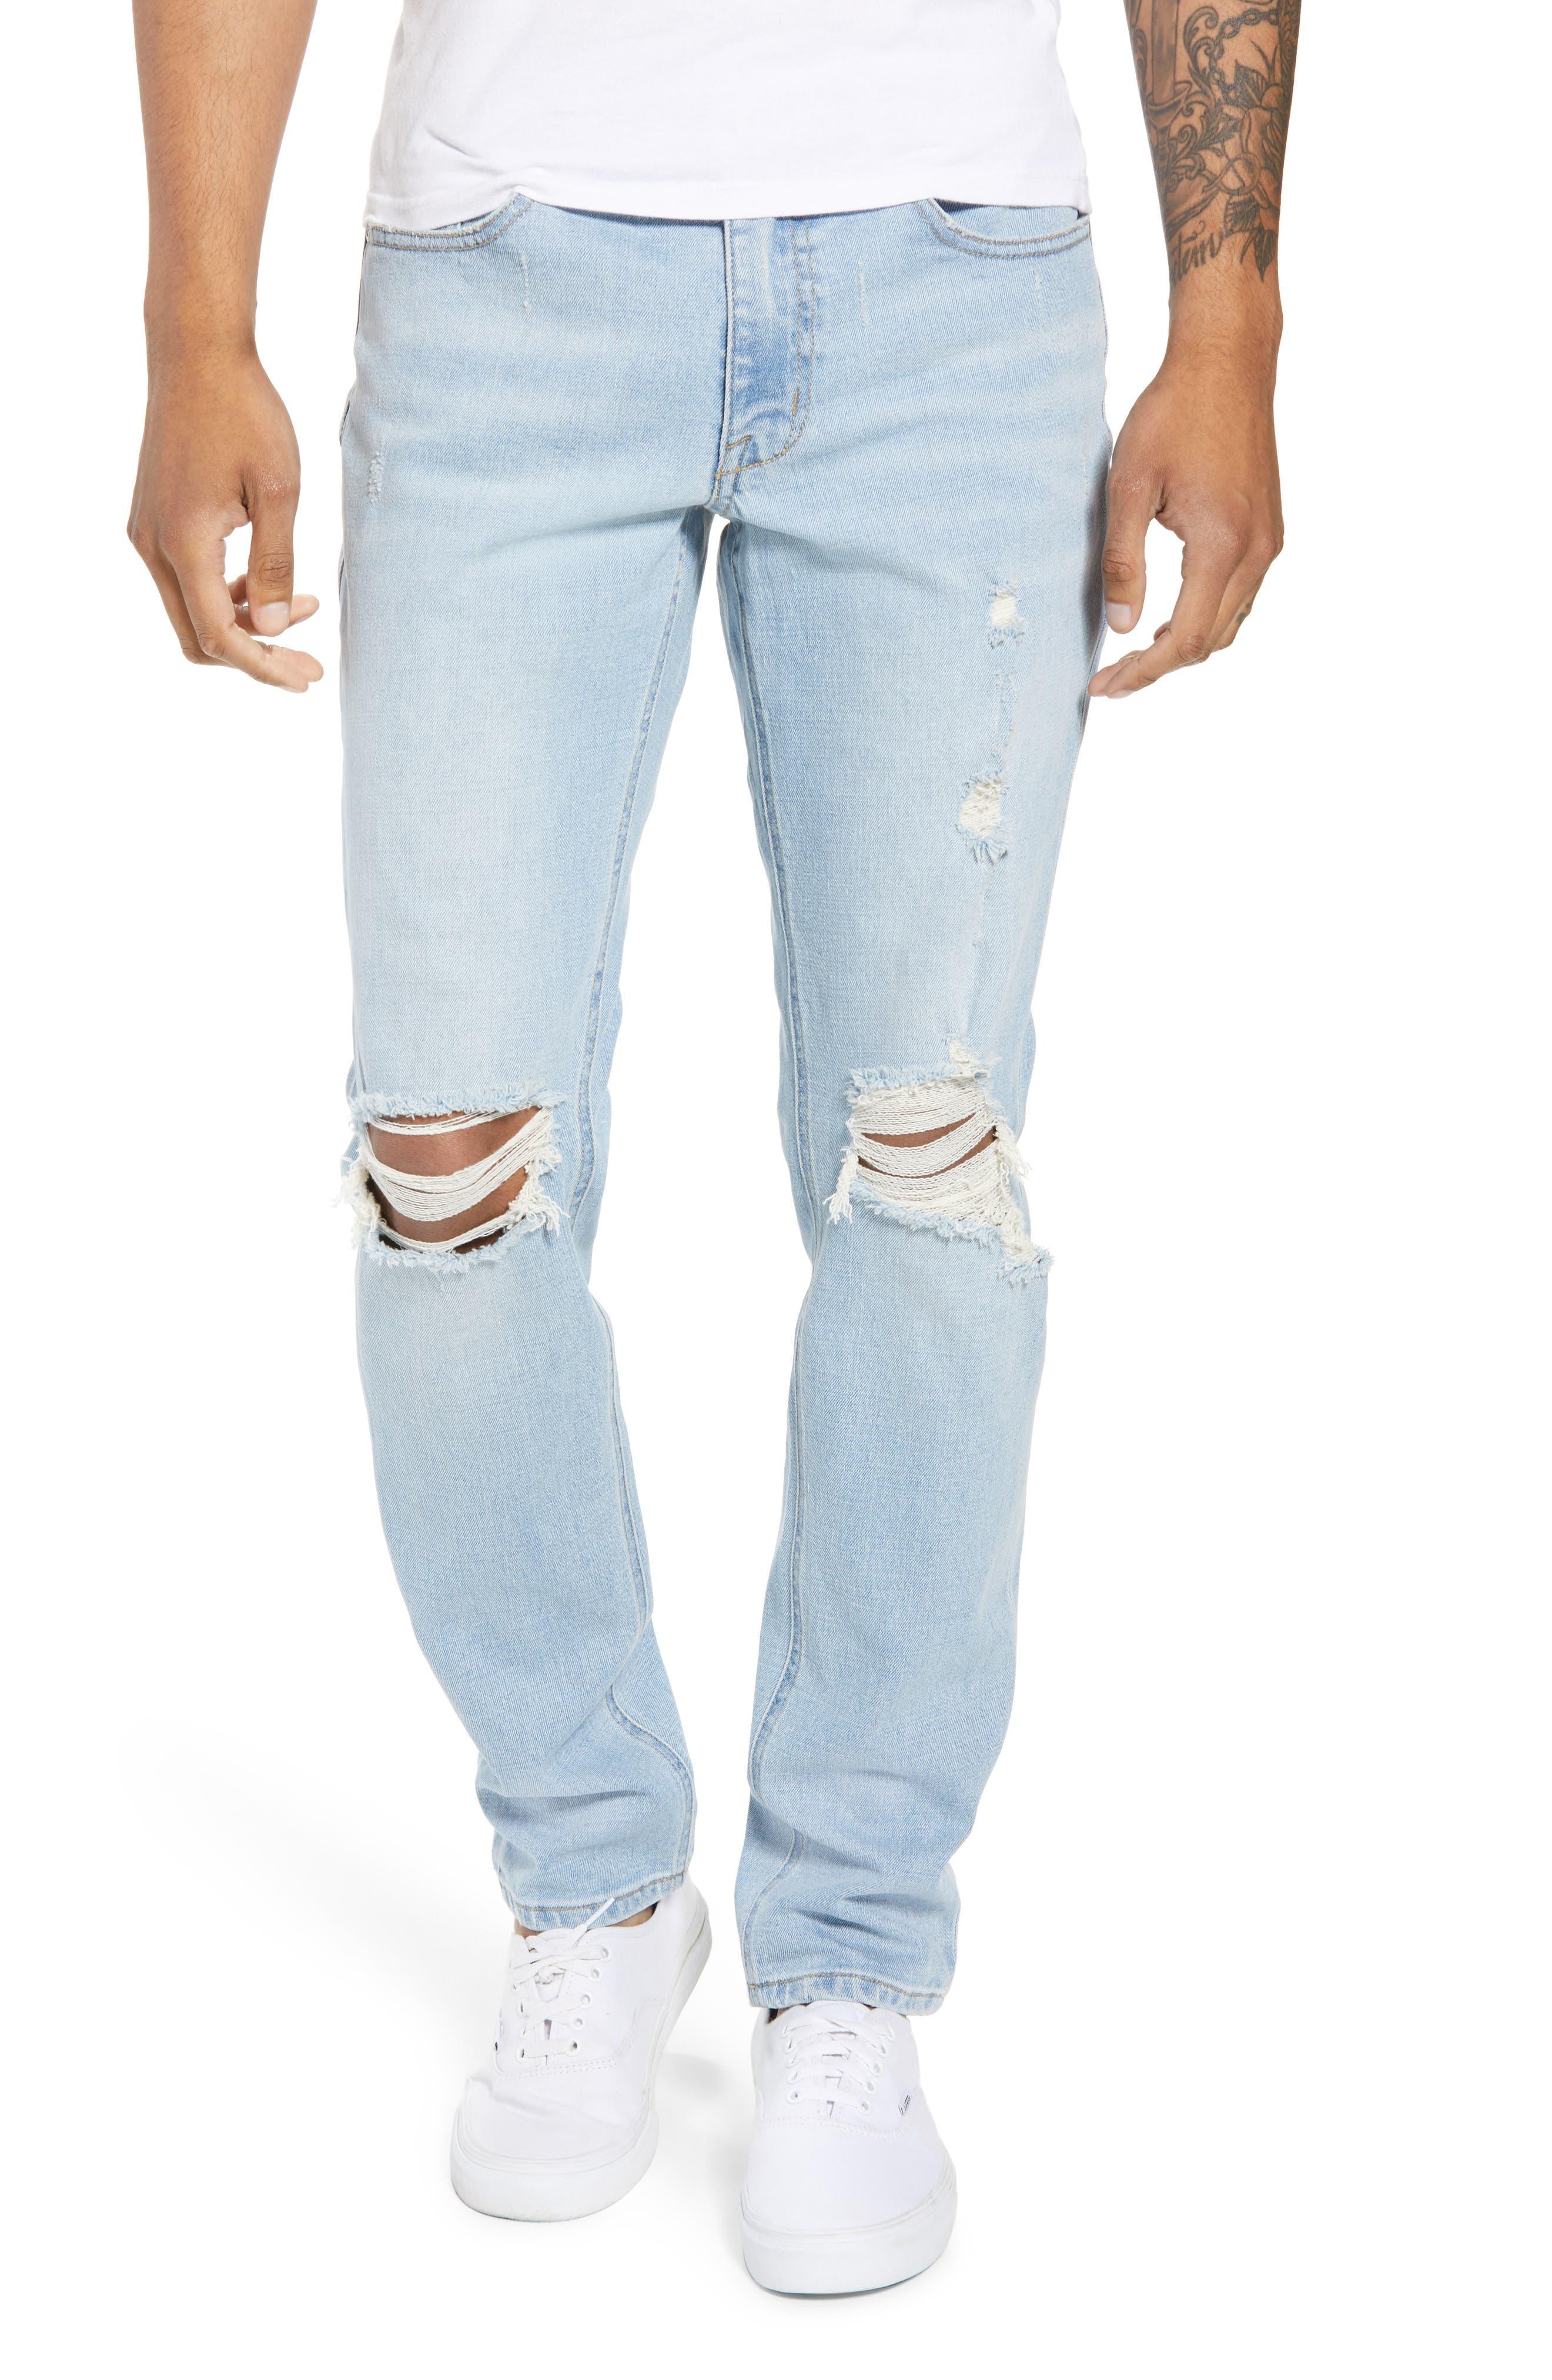 THE RAIL, Ripped Skinny Jeans, Main thumbnail 1, color, BLUE CORGAN WASH